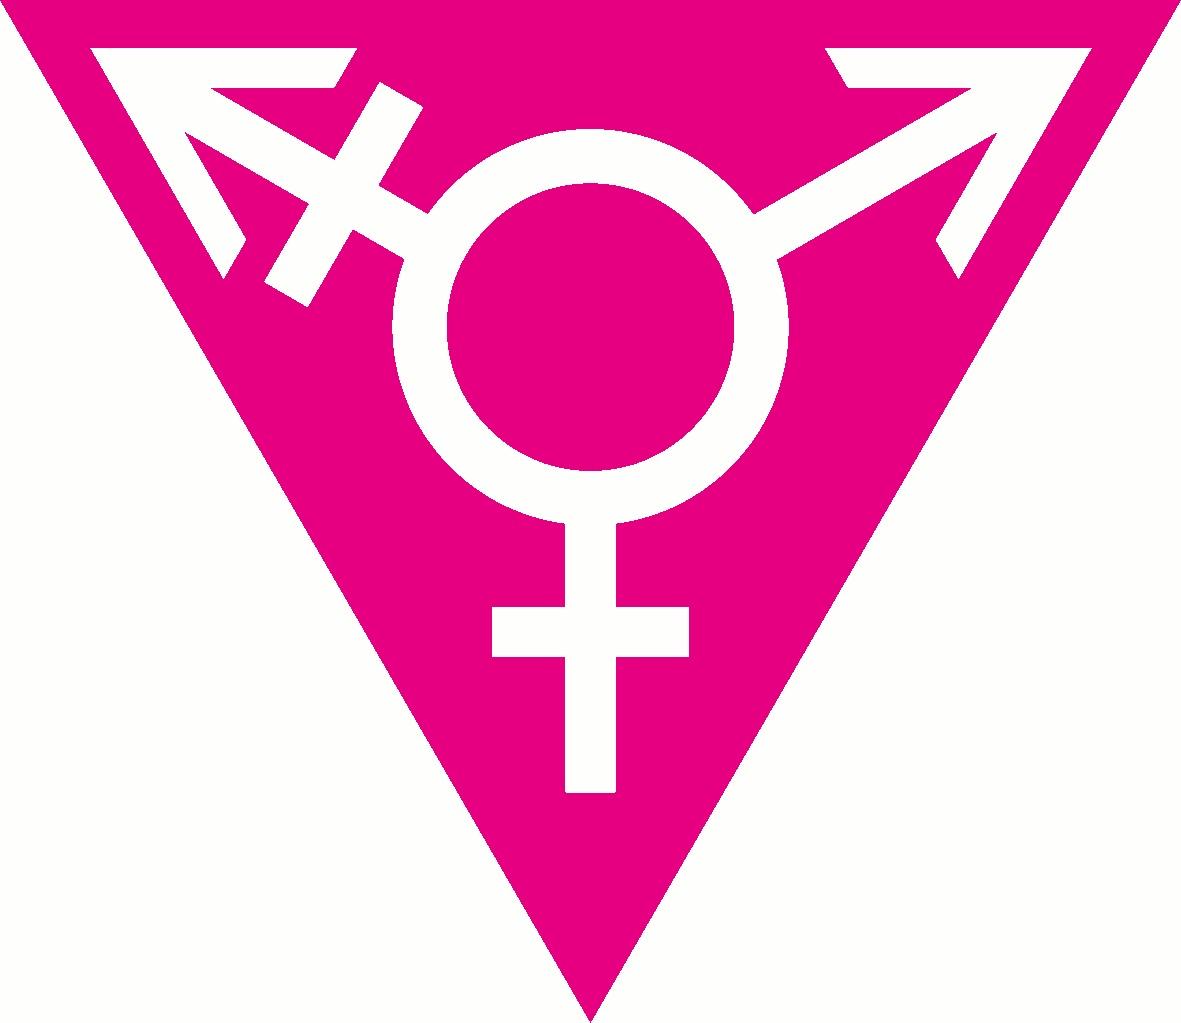 Transgender_triangle.jpg